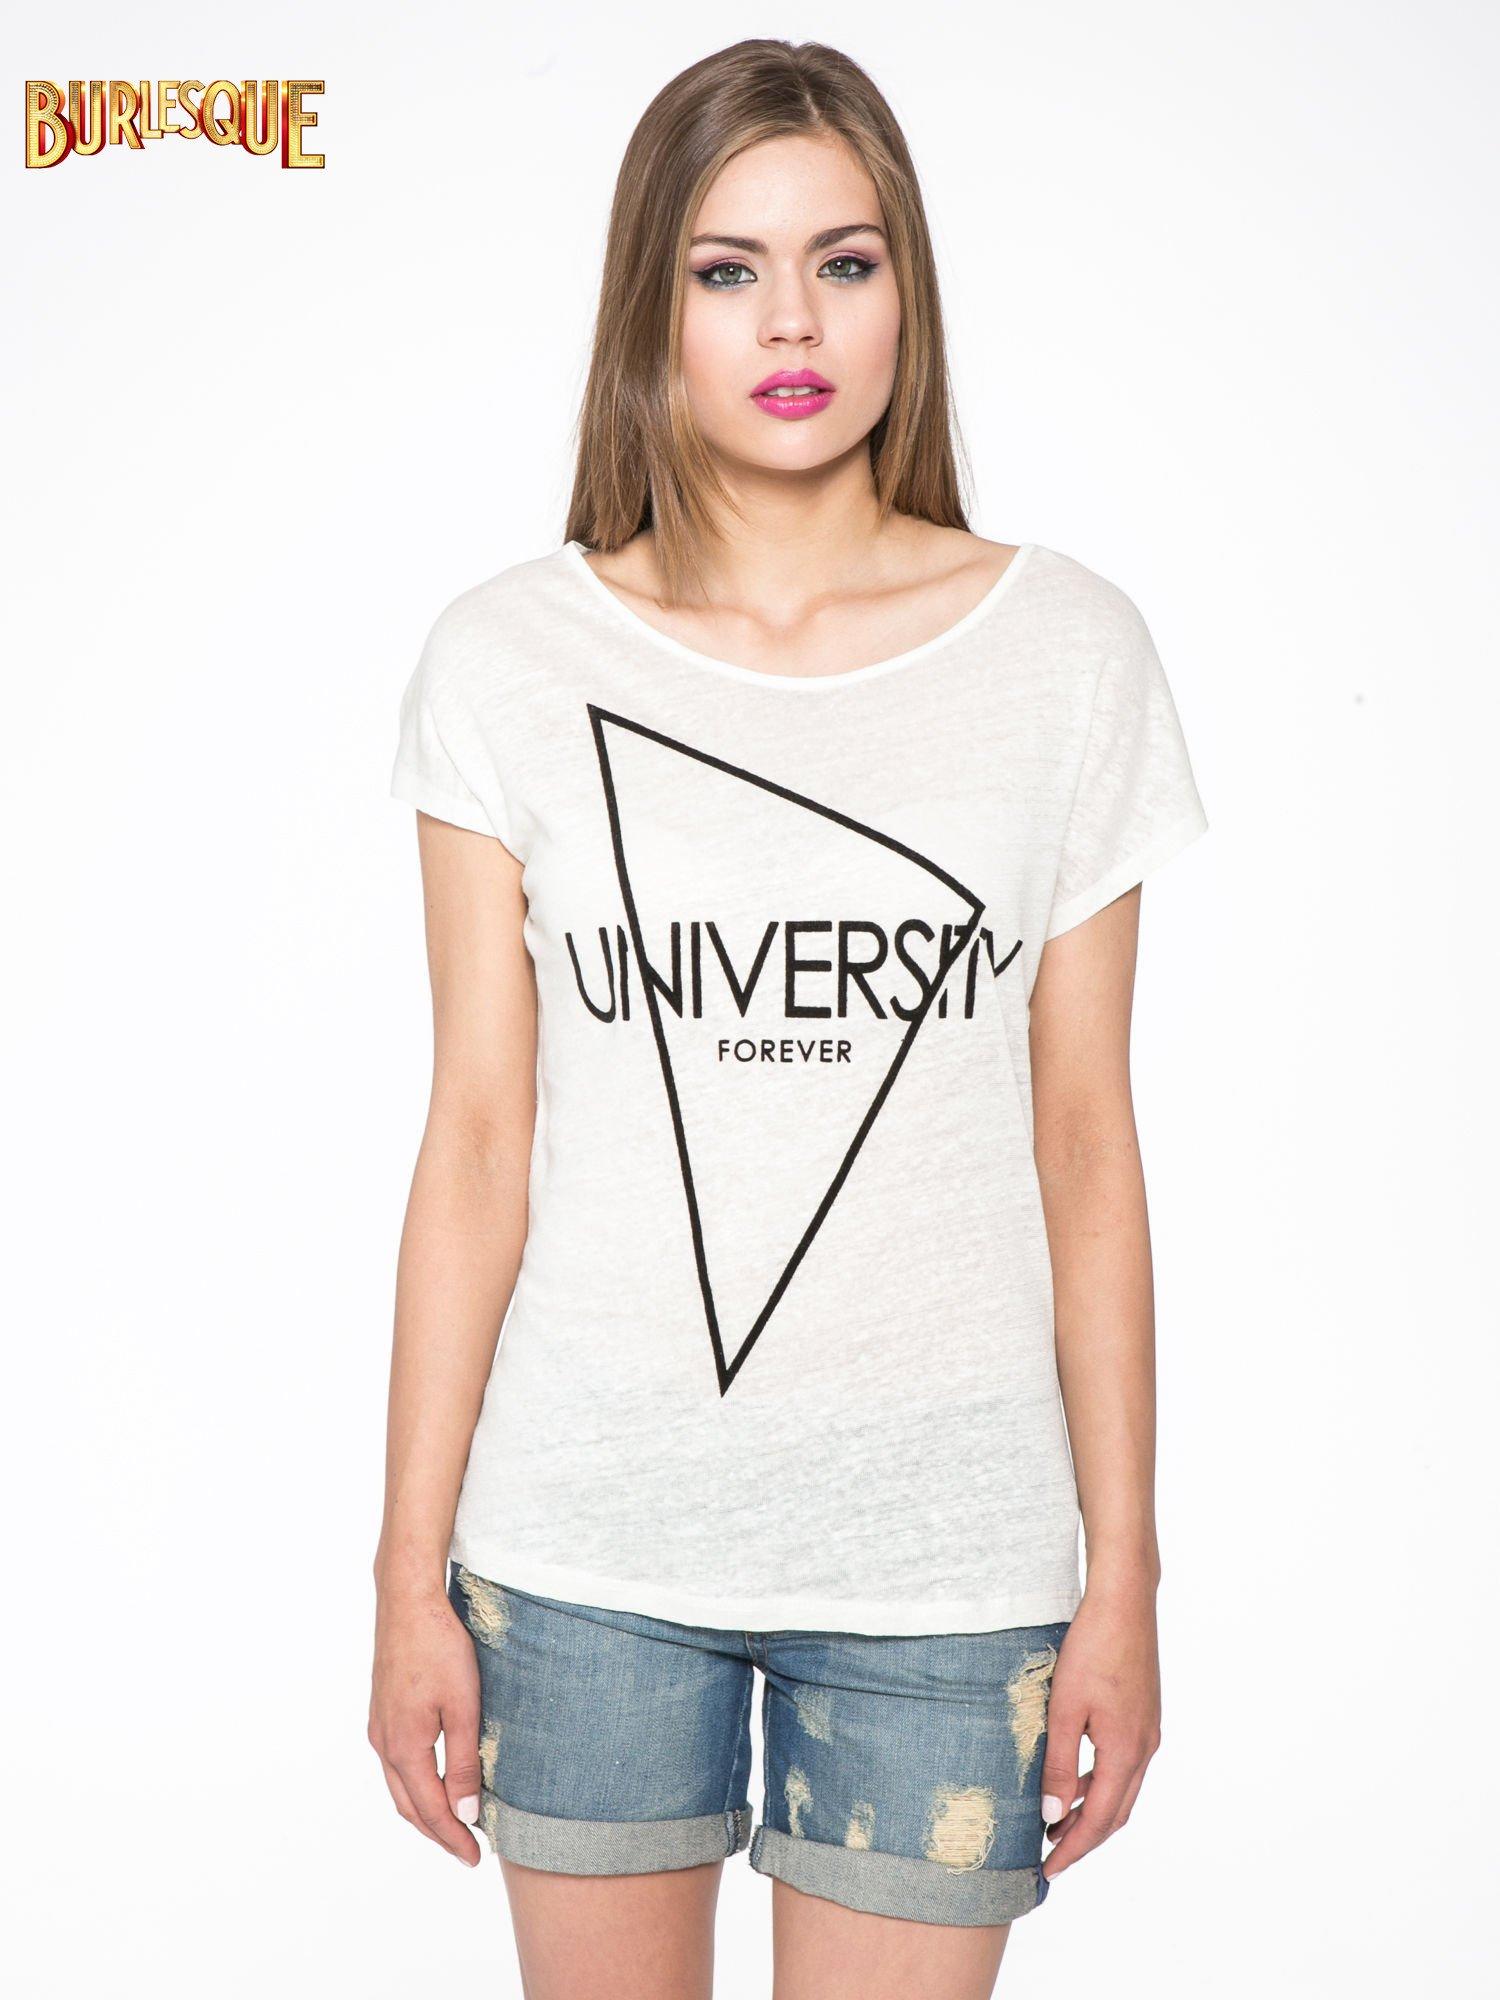 Blady ecru t-shirt z nadrukiem UNIVERSITY FORVER                                  zdj.                                  11